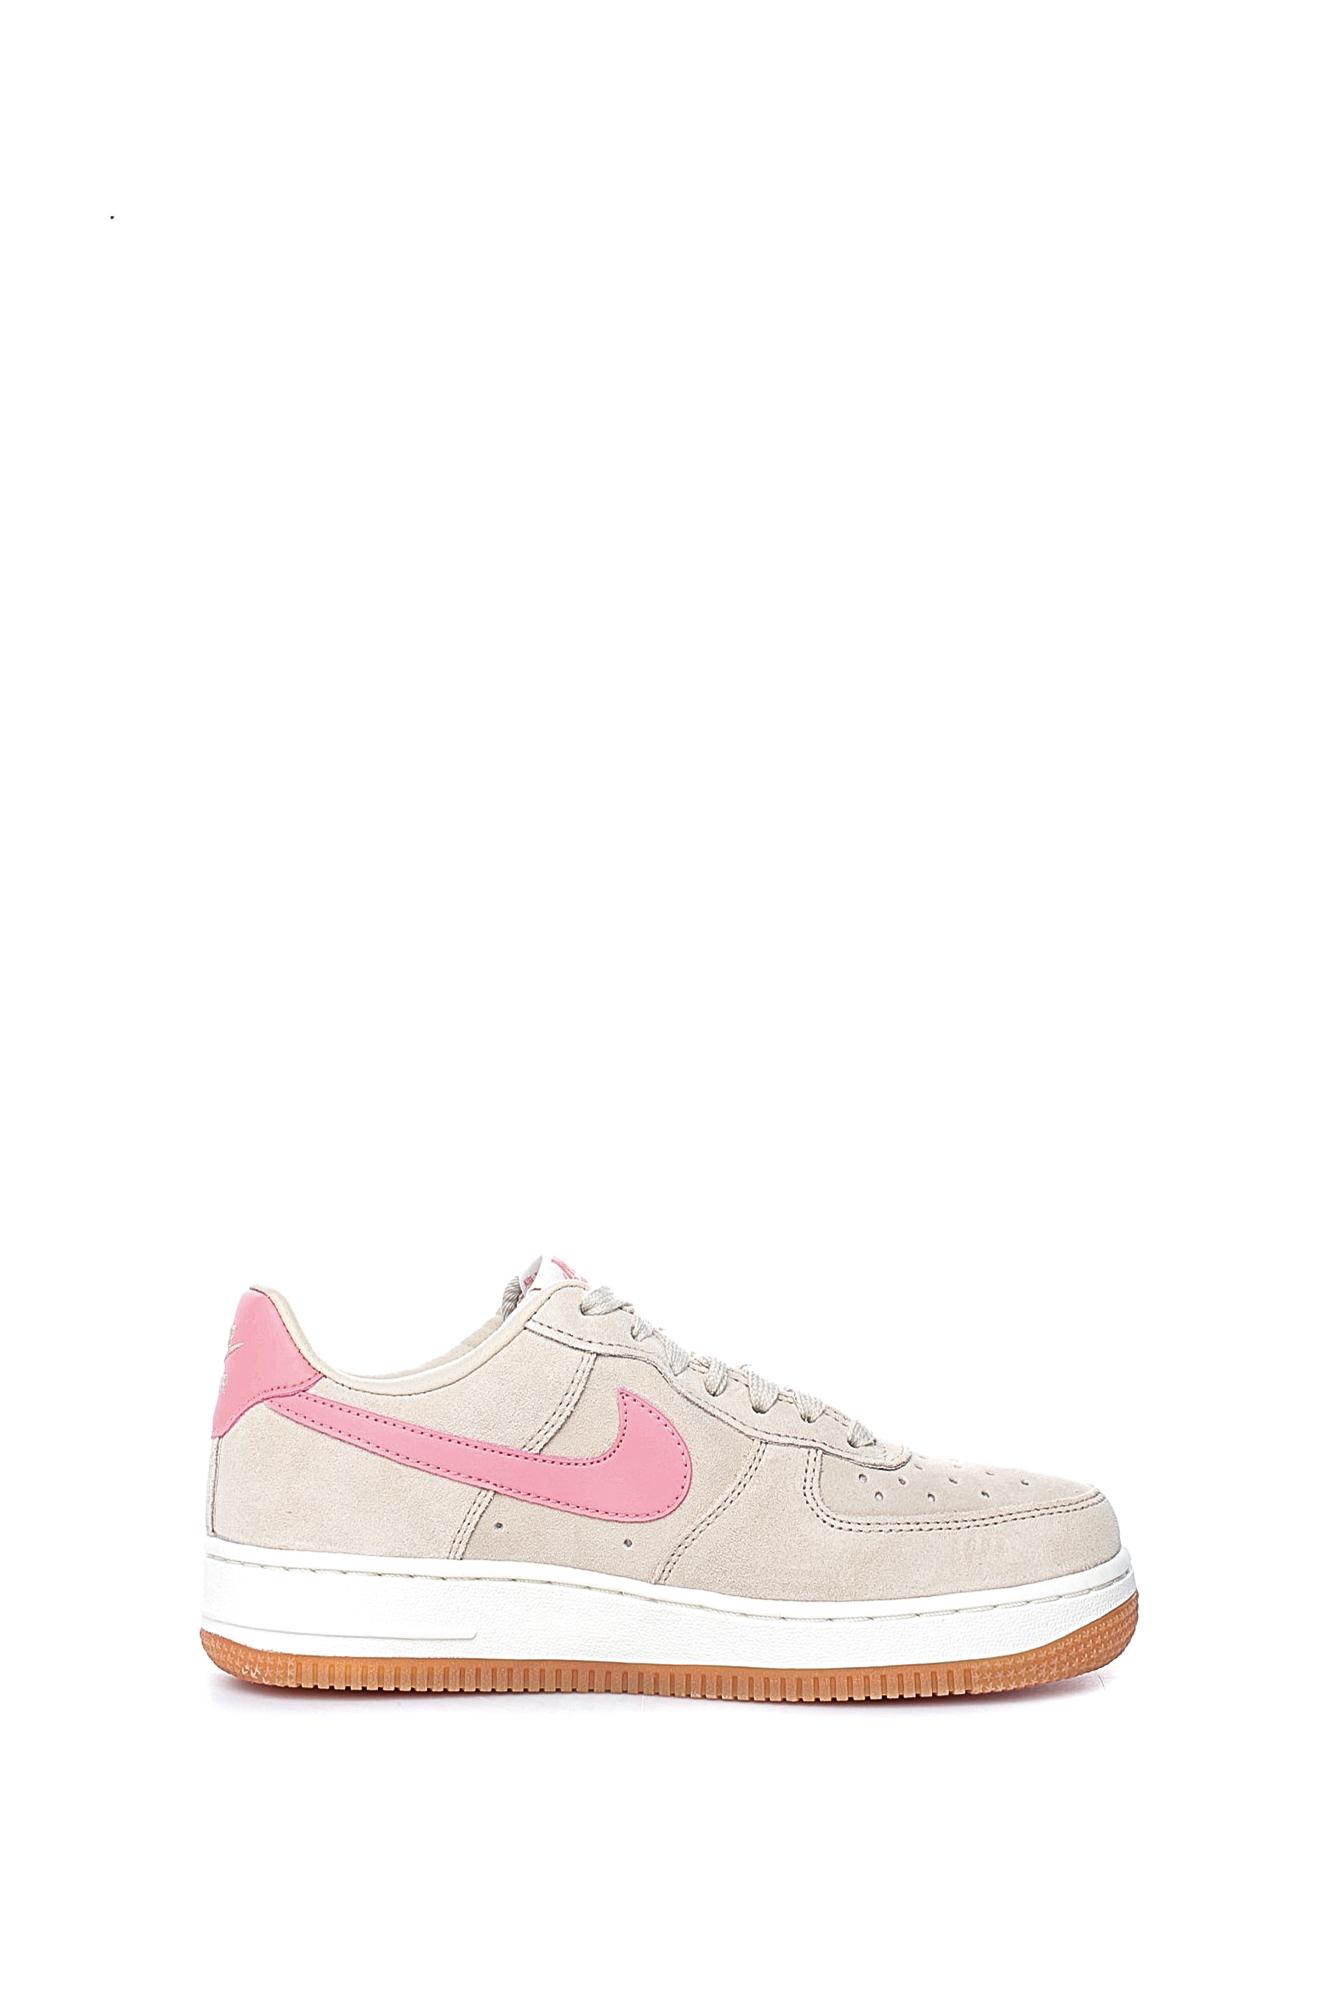 NIKE – Γυναικεία παπούτσια AIR FORCE 1 LV8 μπεζ